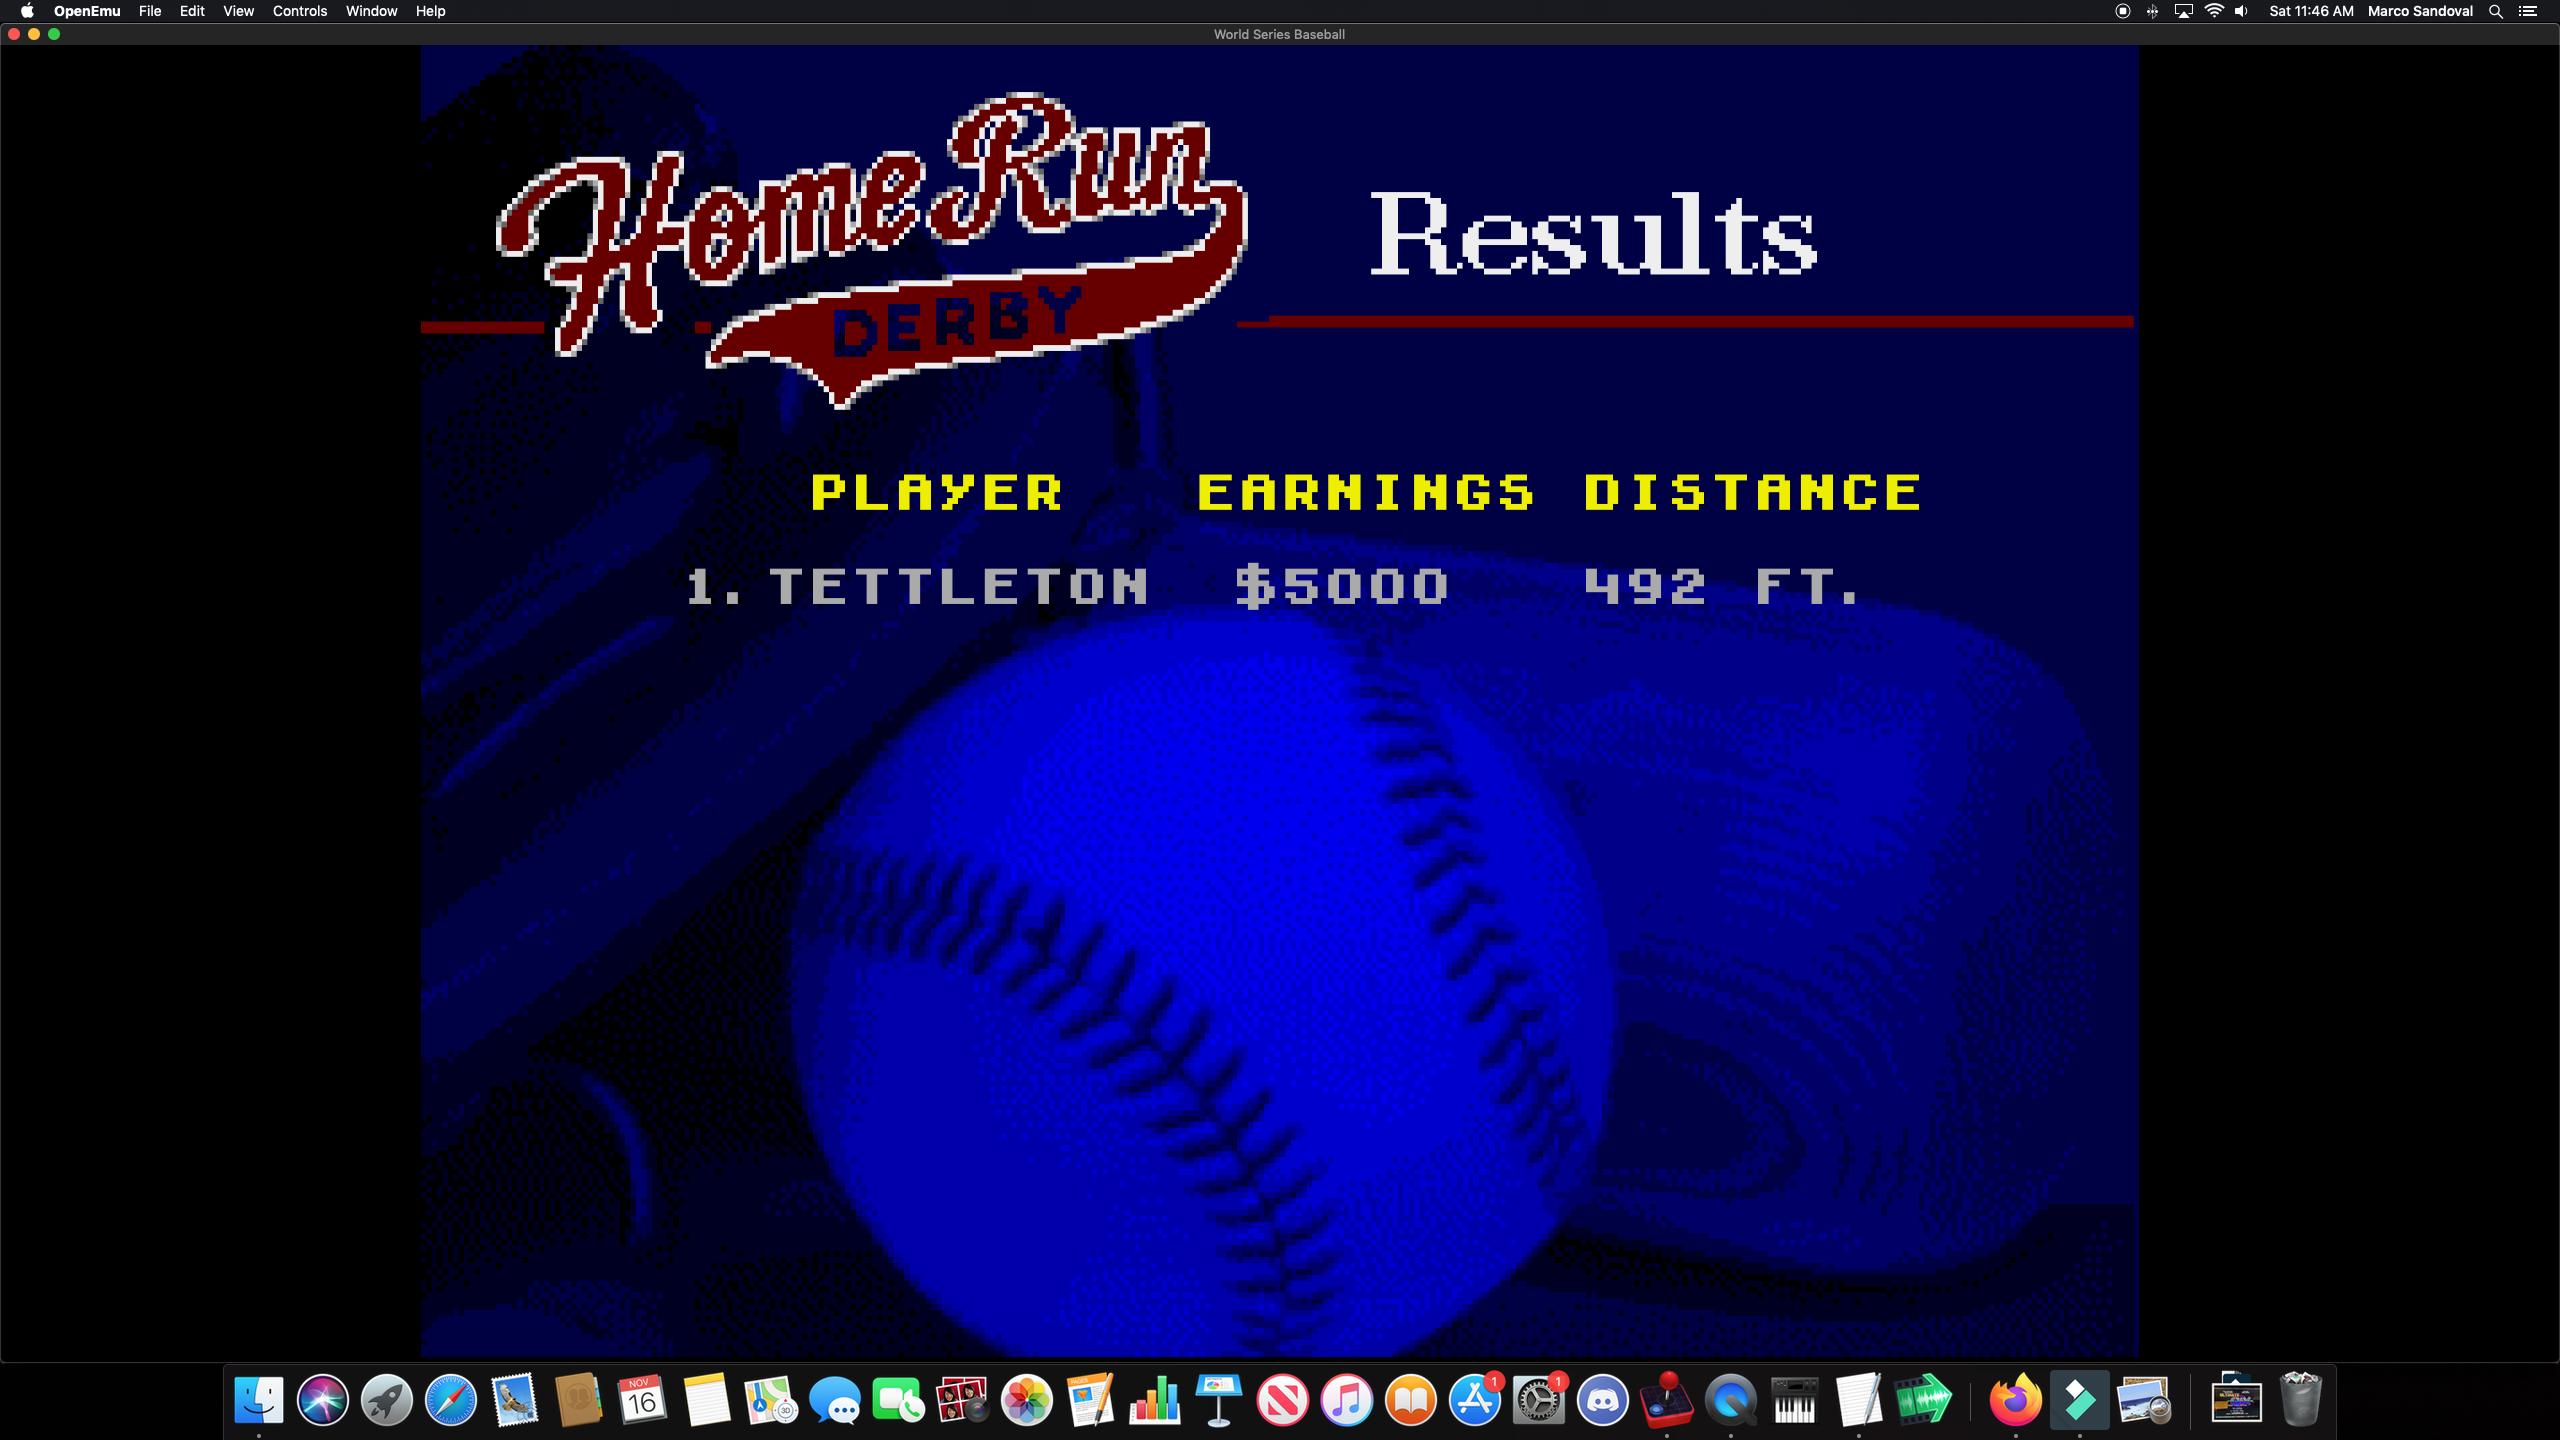 Marco1019: World Series Baseball: Home Run Derby (Sega Genesis / MegaDrive Emulated) 5 points on 2019-11-16 15:20:11